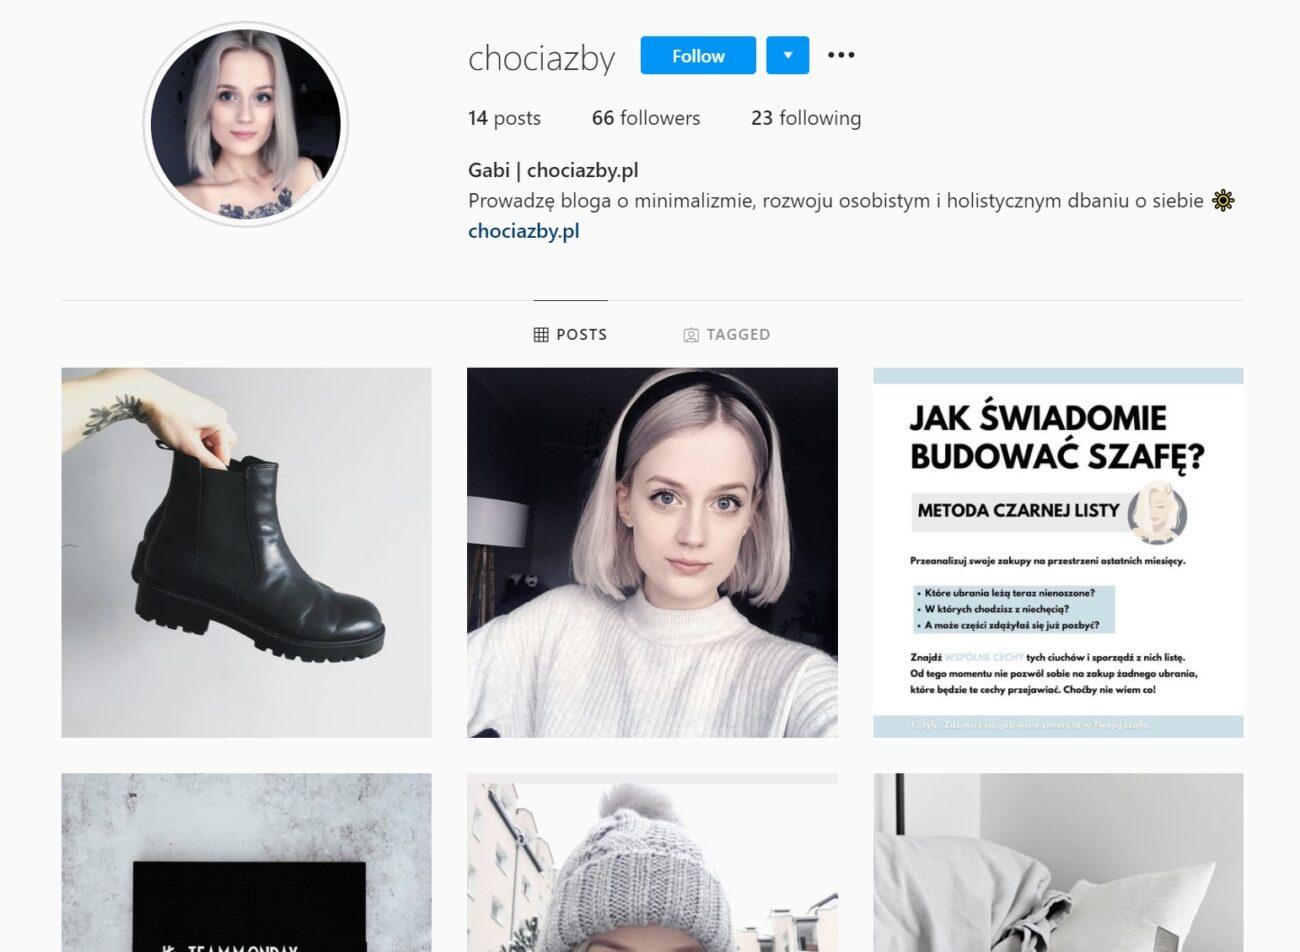 instagram-chociazby-pl-blog-minimalizm-szafa